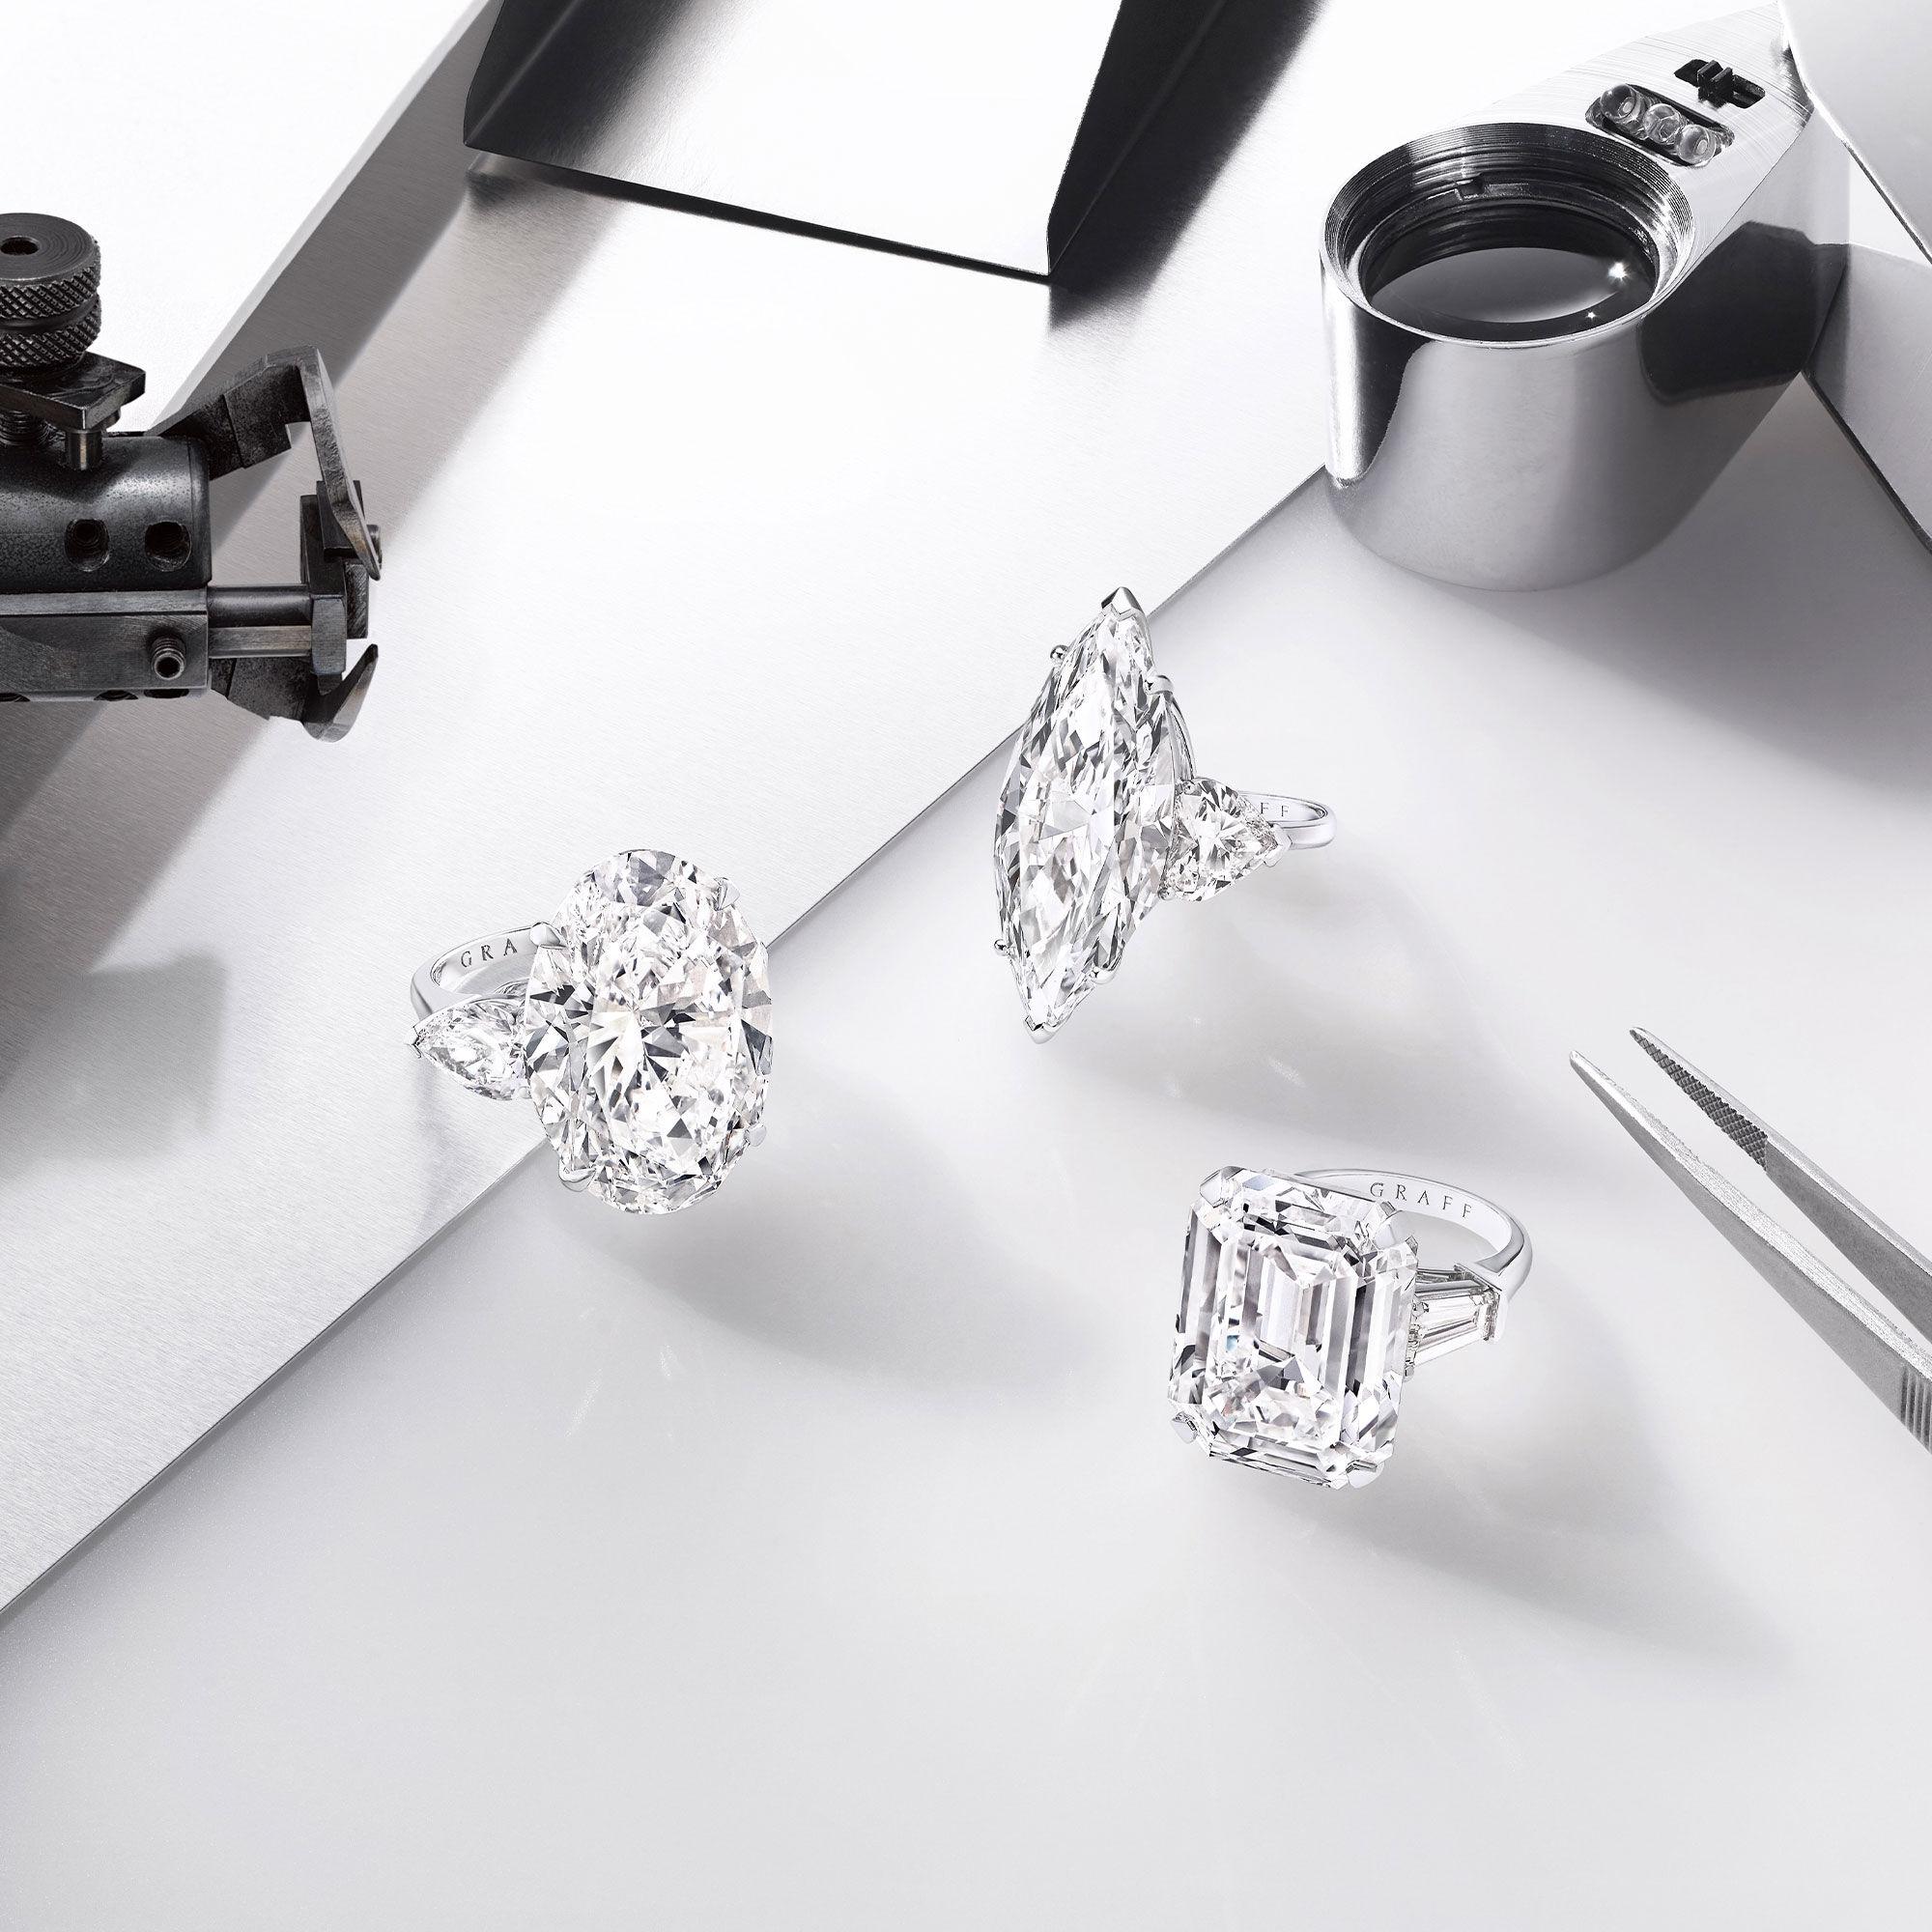 Three high jewellery diamond ring by Graff with diamond setting tools